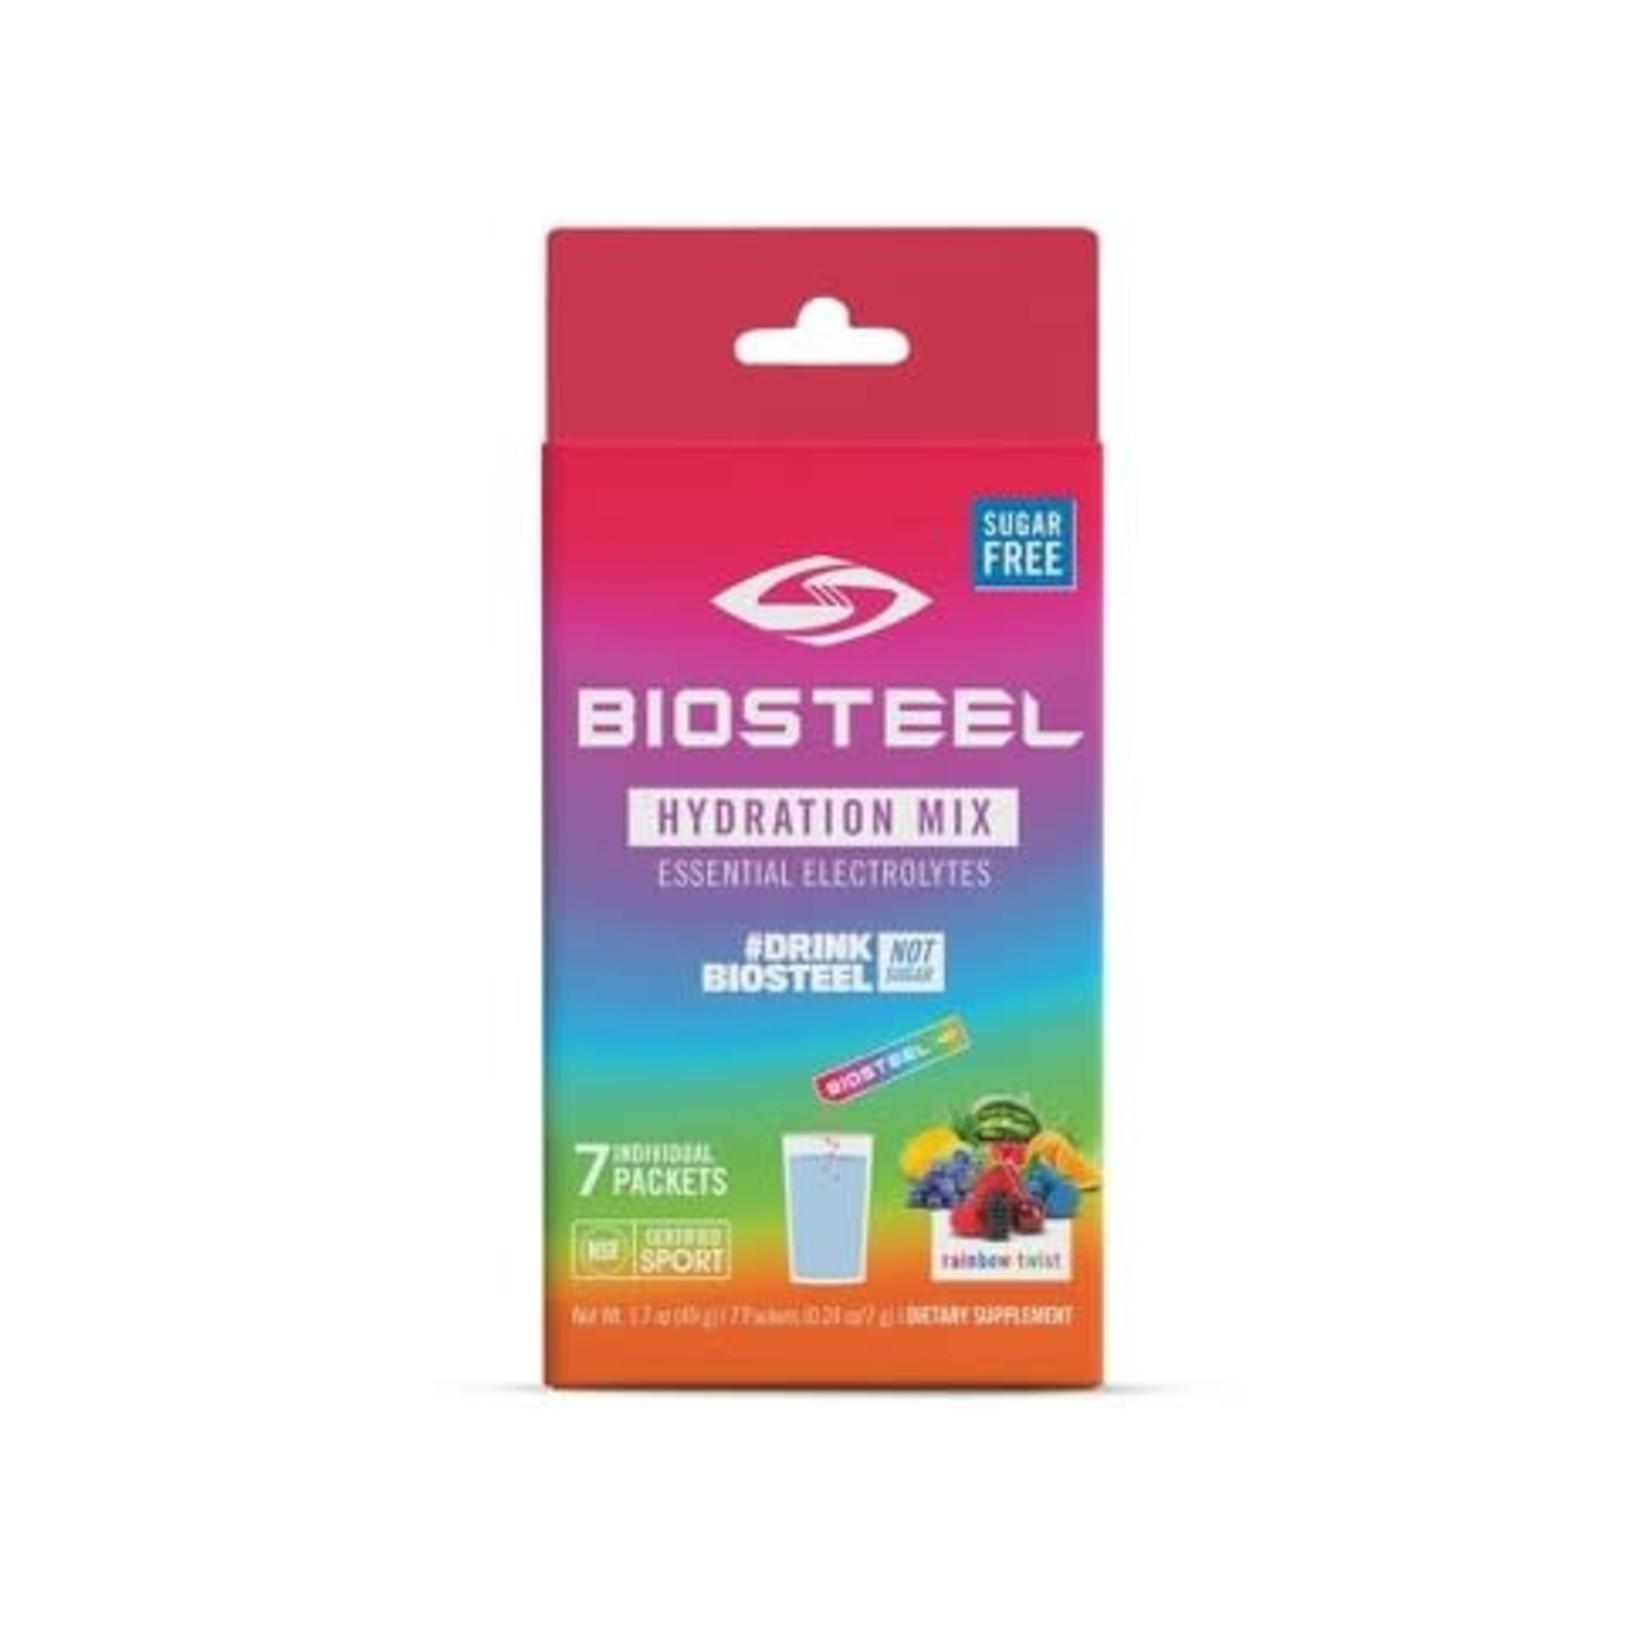 BioSteel Biosteel Hydration Mix, 7ct Box